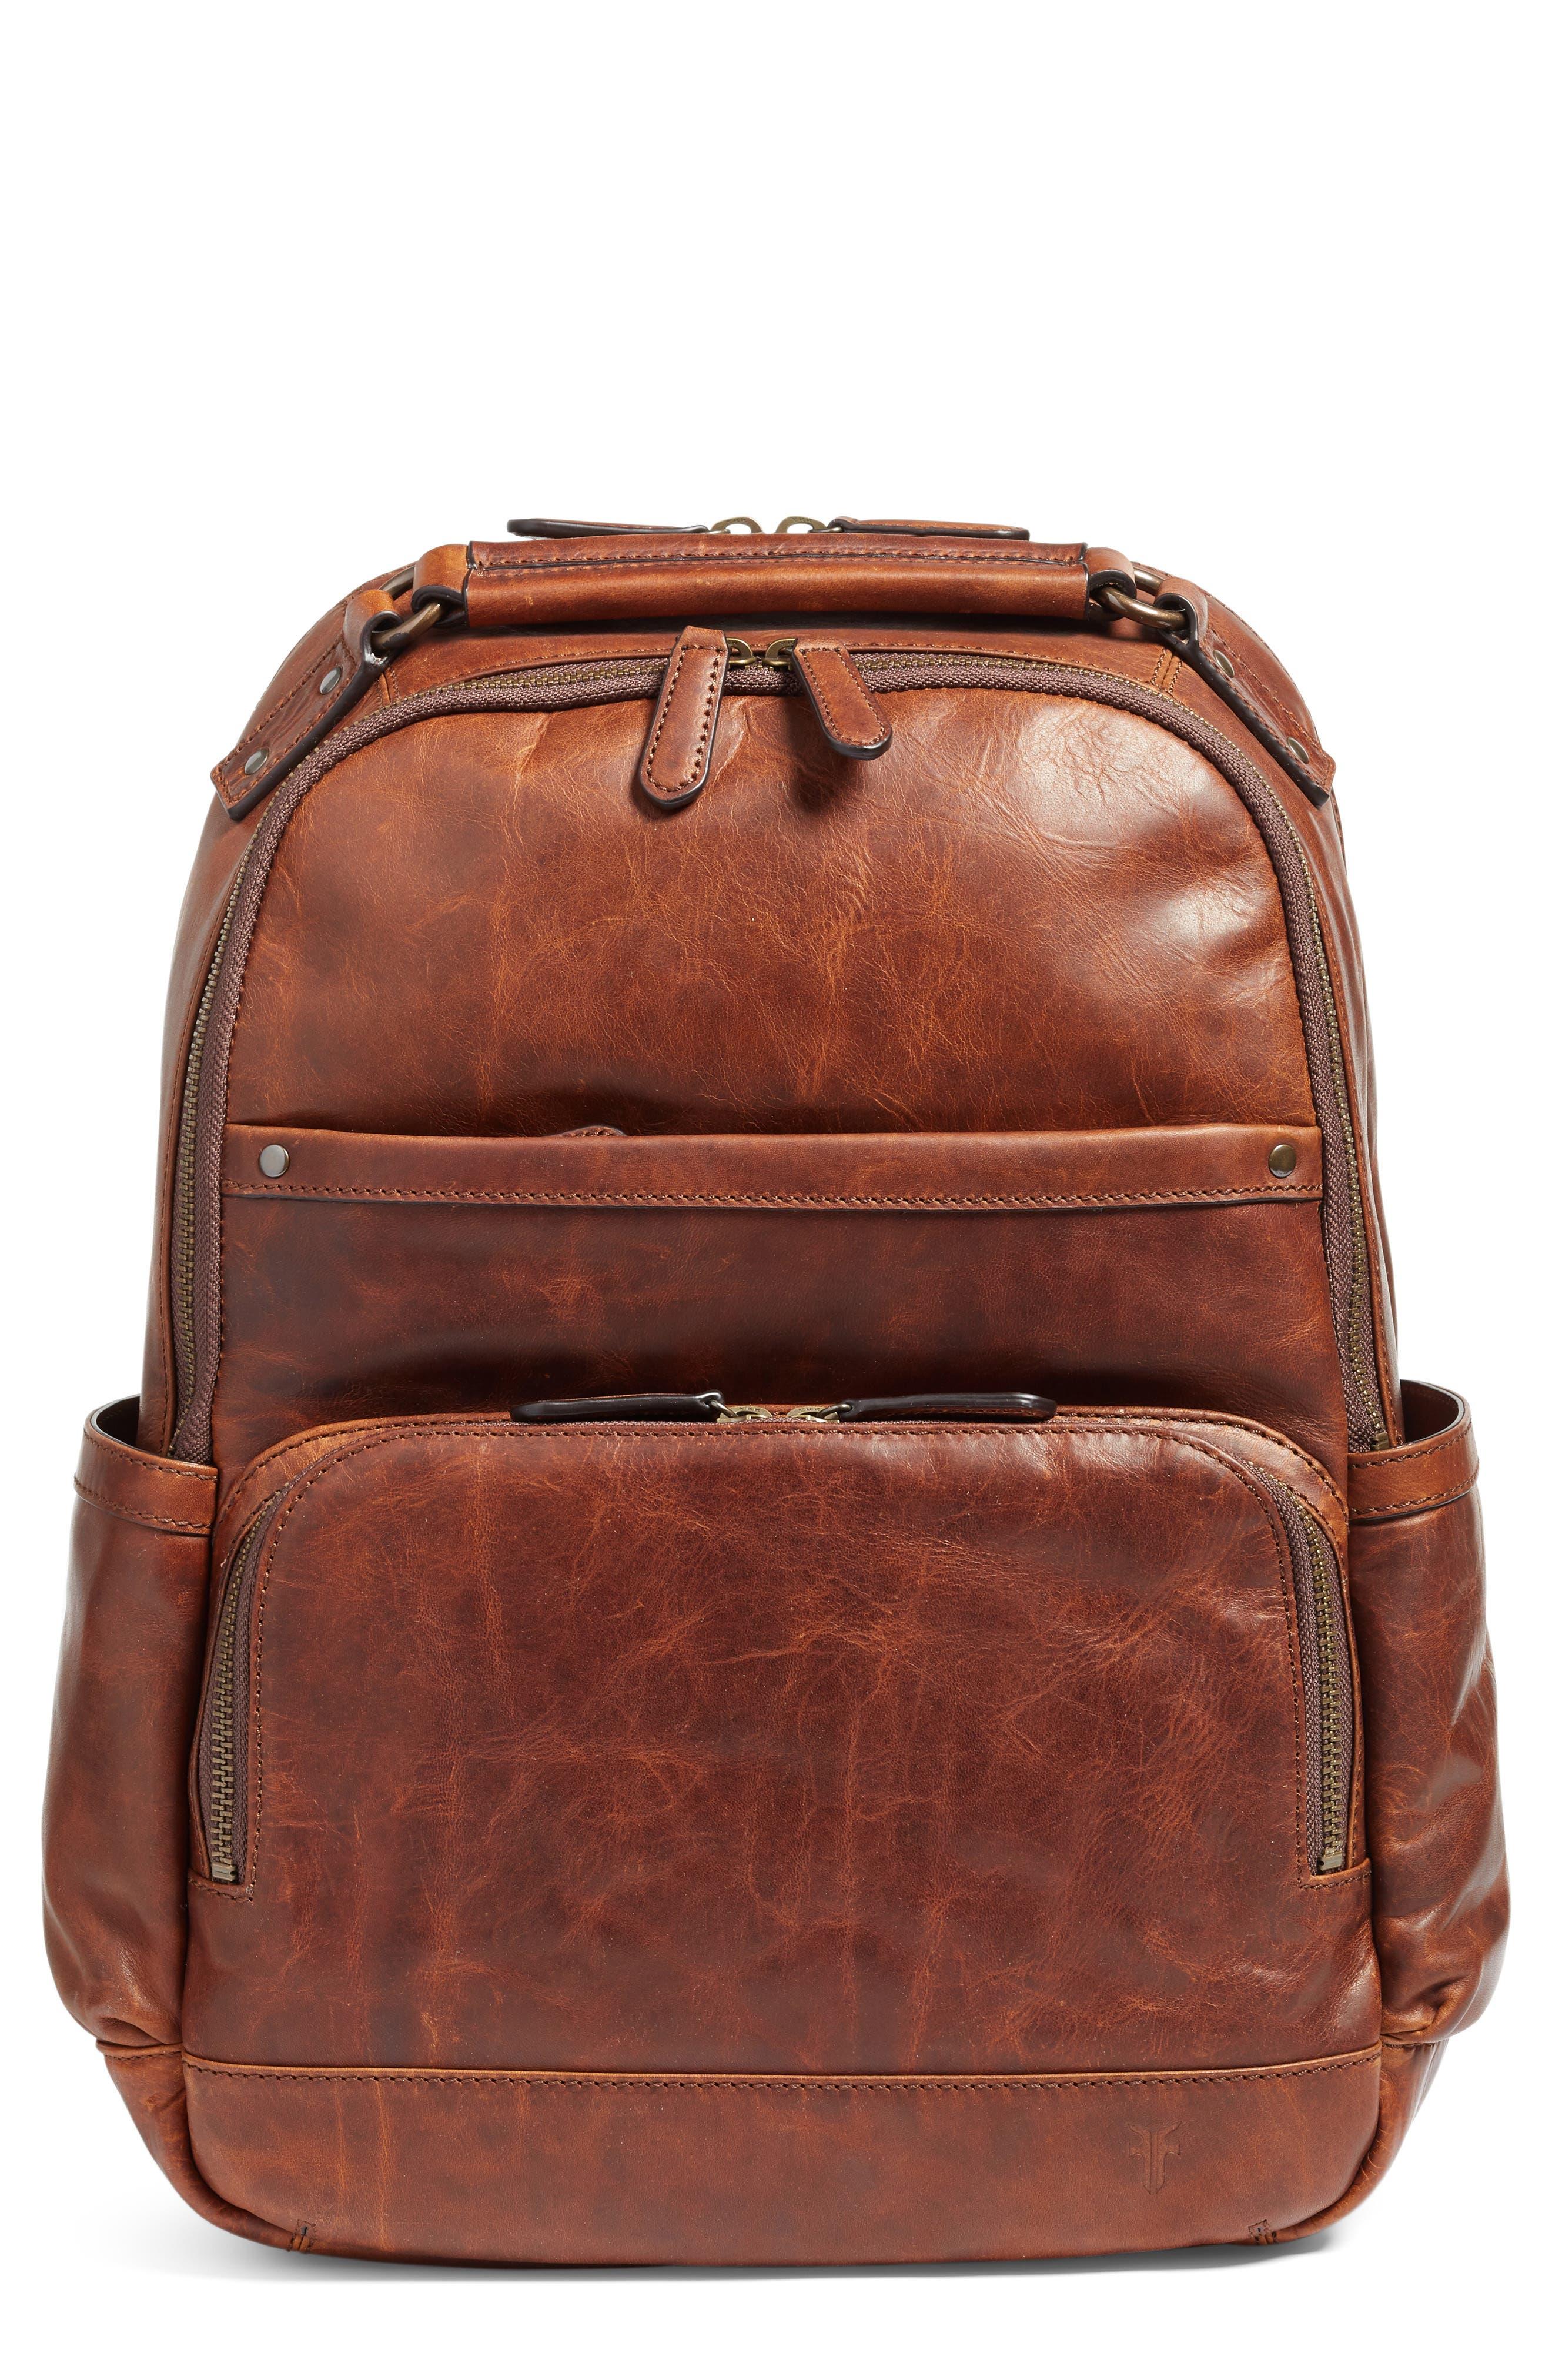 Alternate Image 1 Selected - Frye 'Logan' Leather Backpack